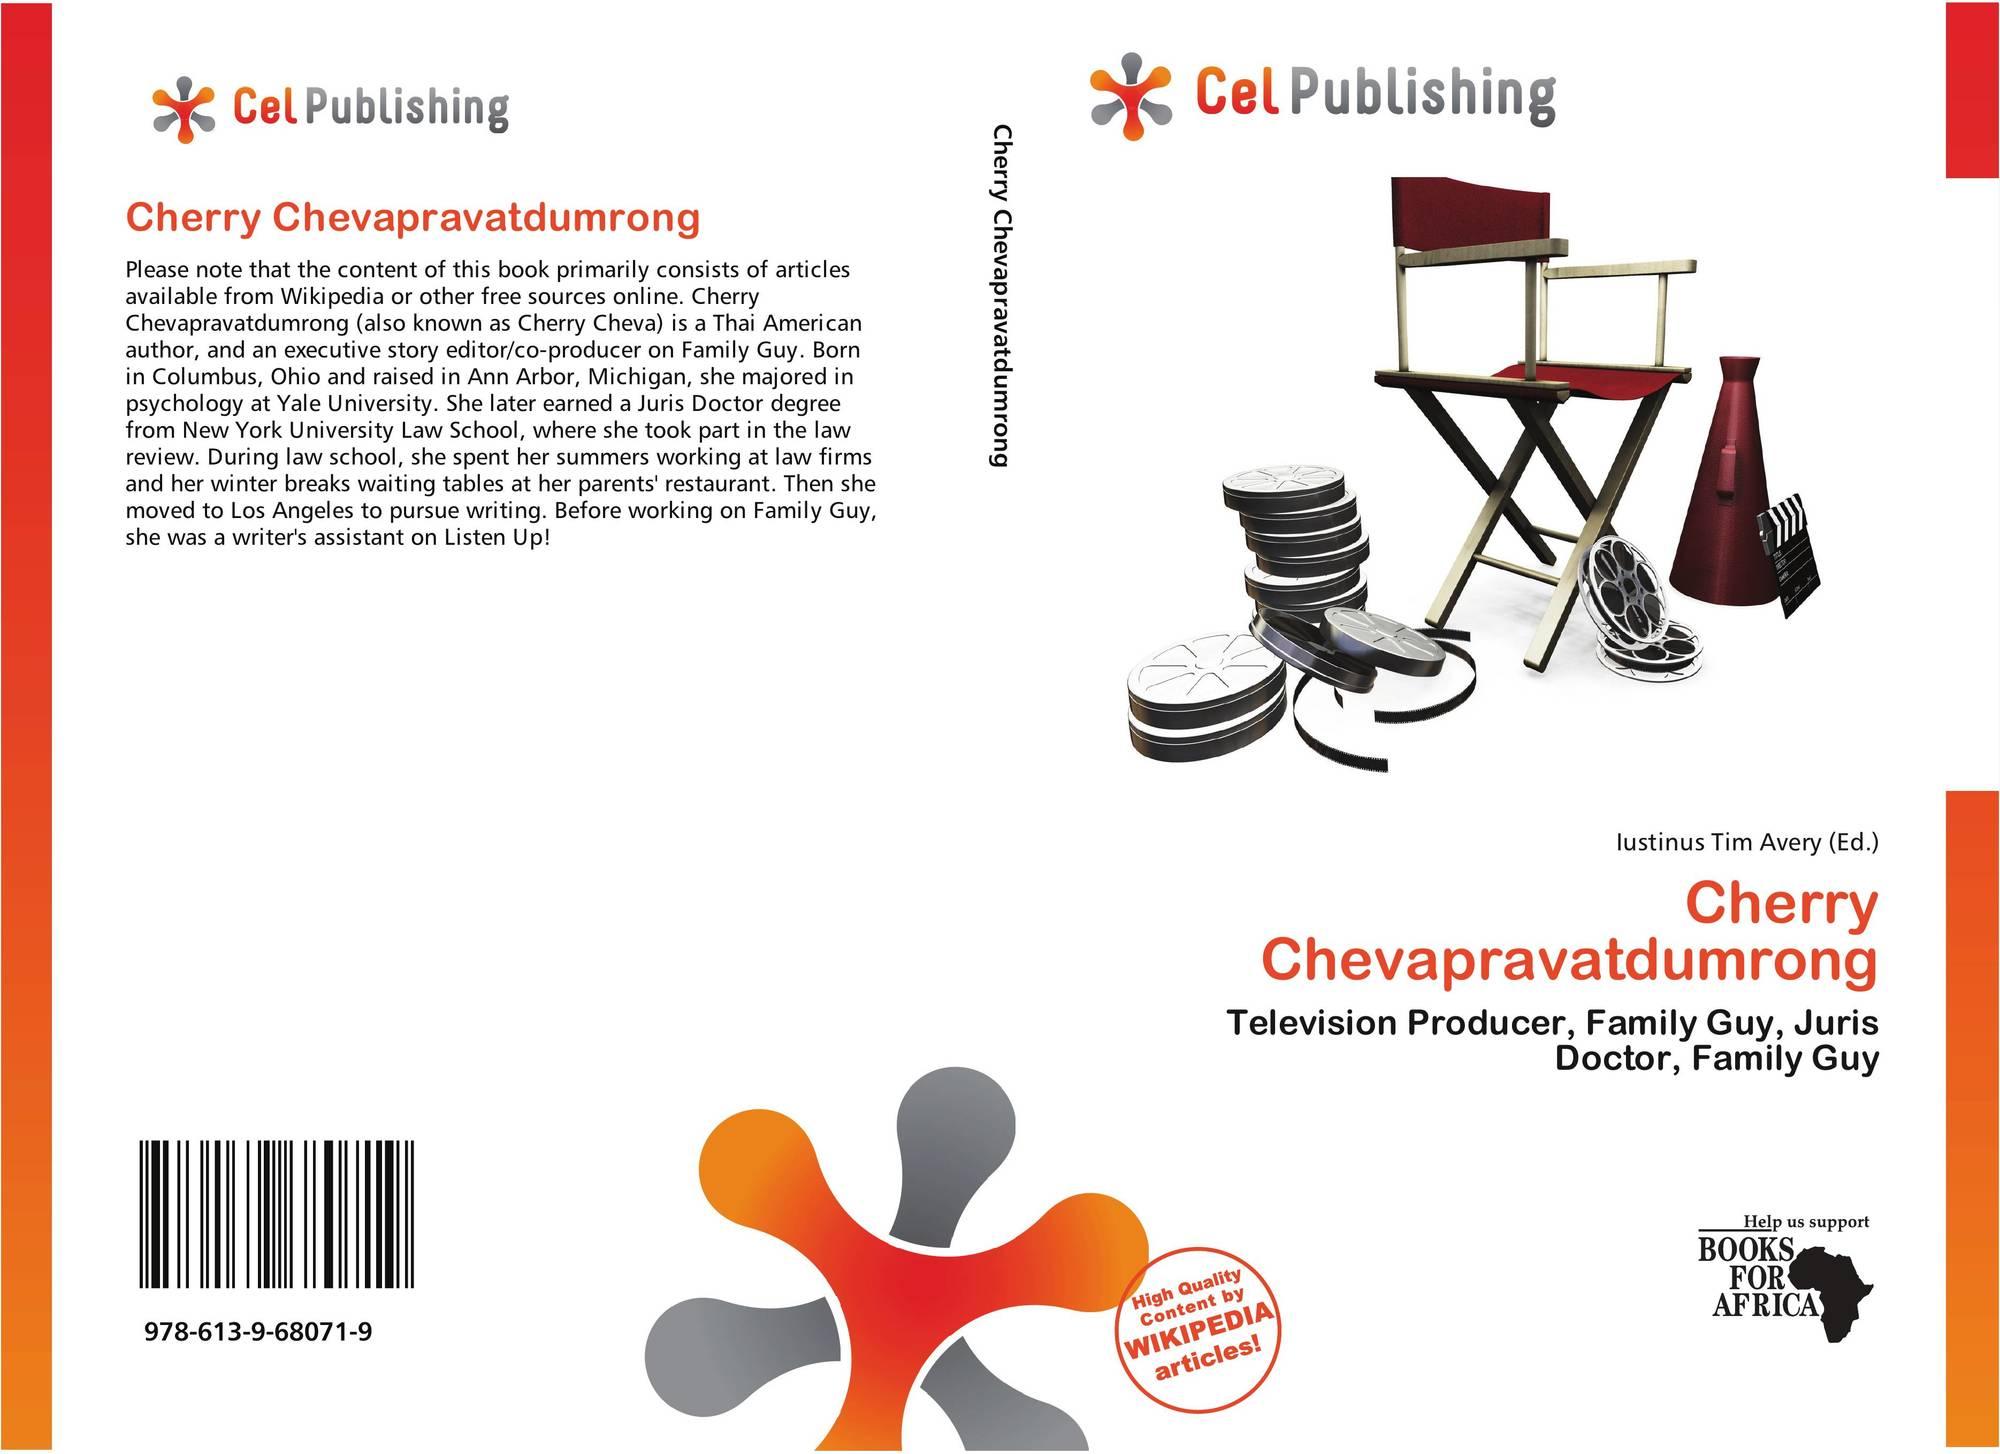 Cherry Chevapravatdumrong 978 613 9 68071 9 6139680719 9786139680719 She's so money, duplikate, open mic, empower: morebooks